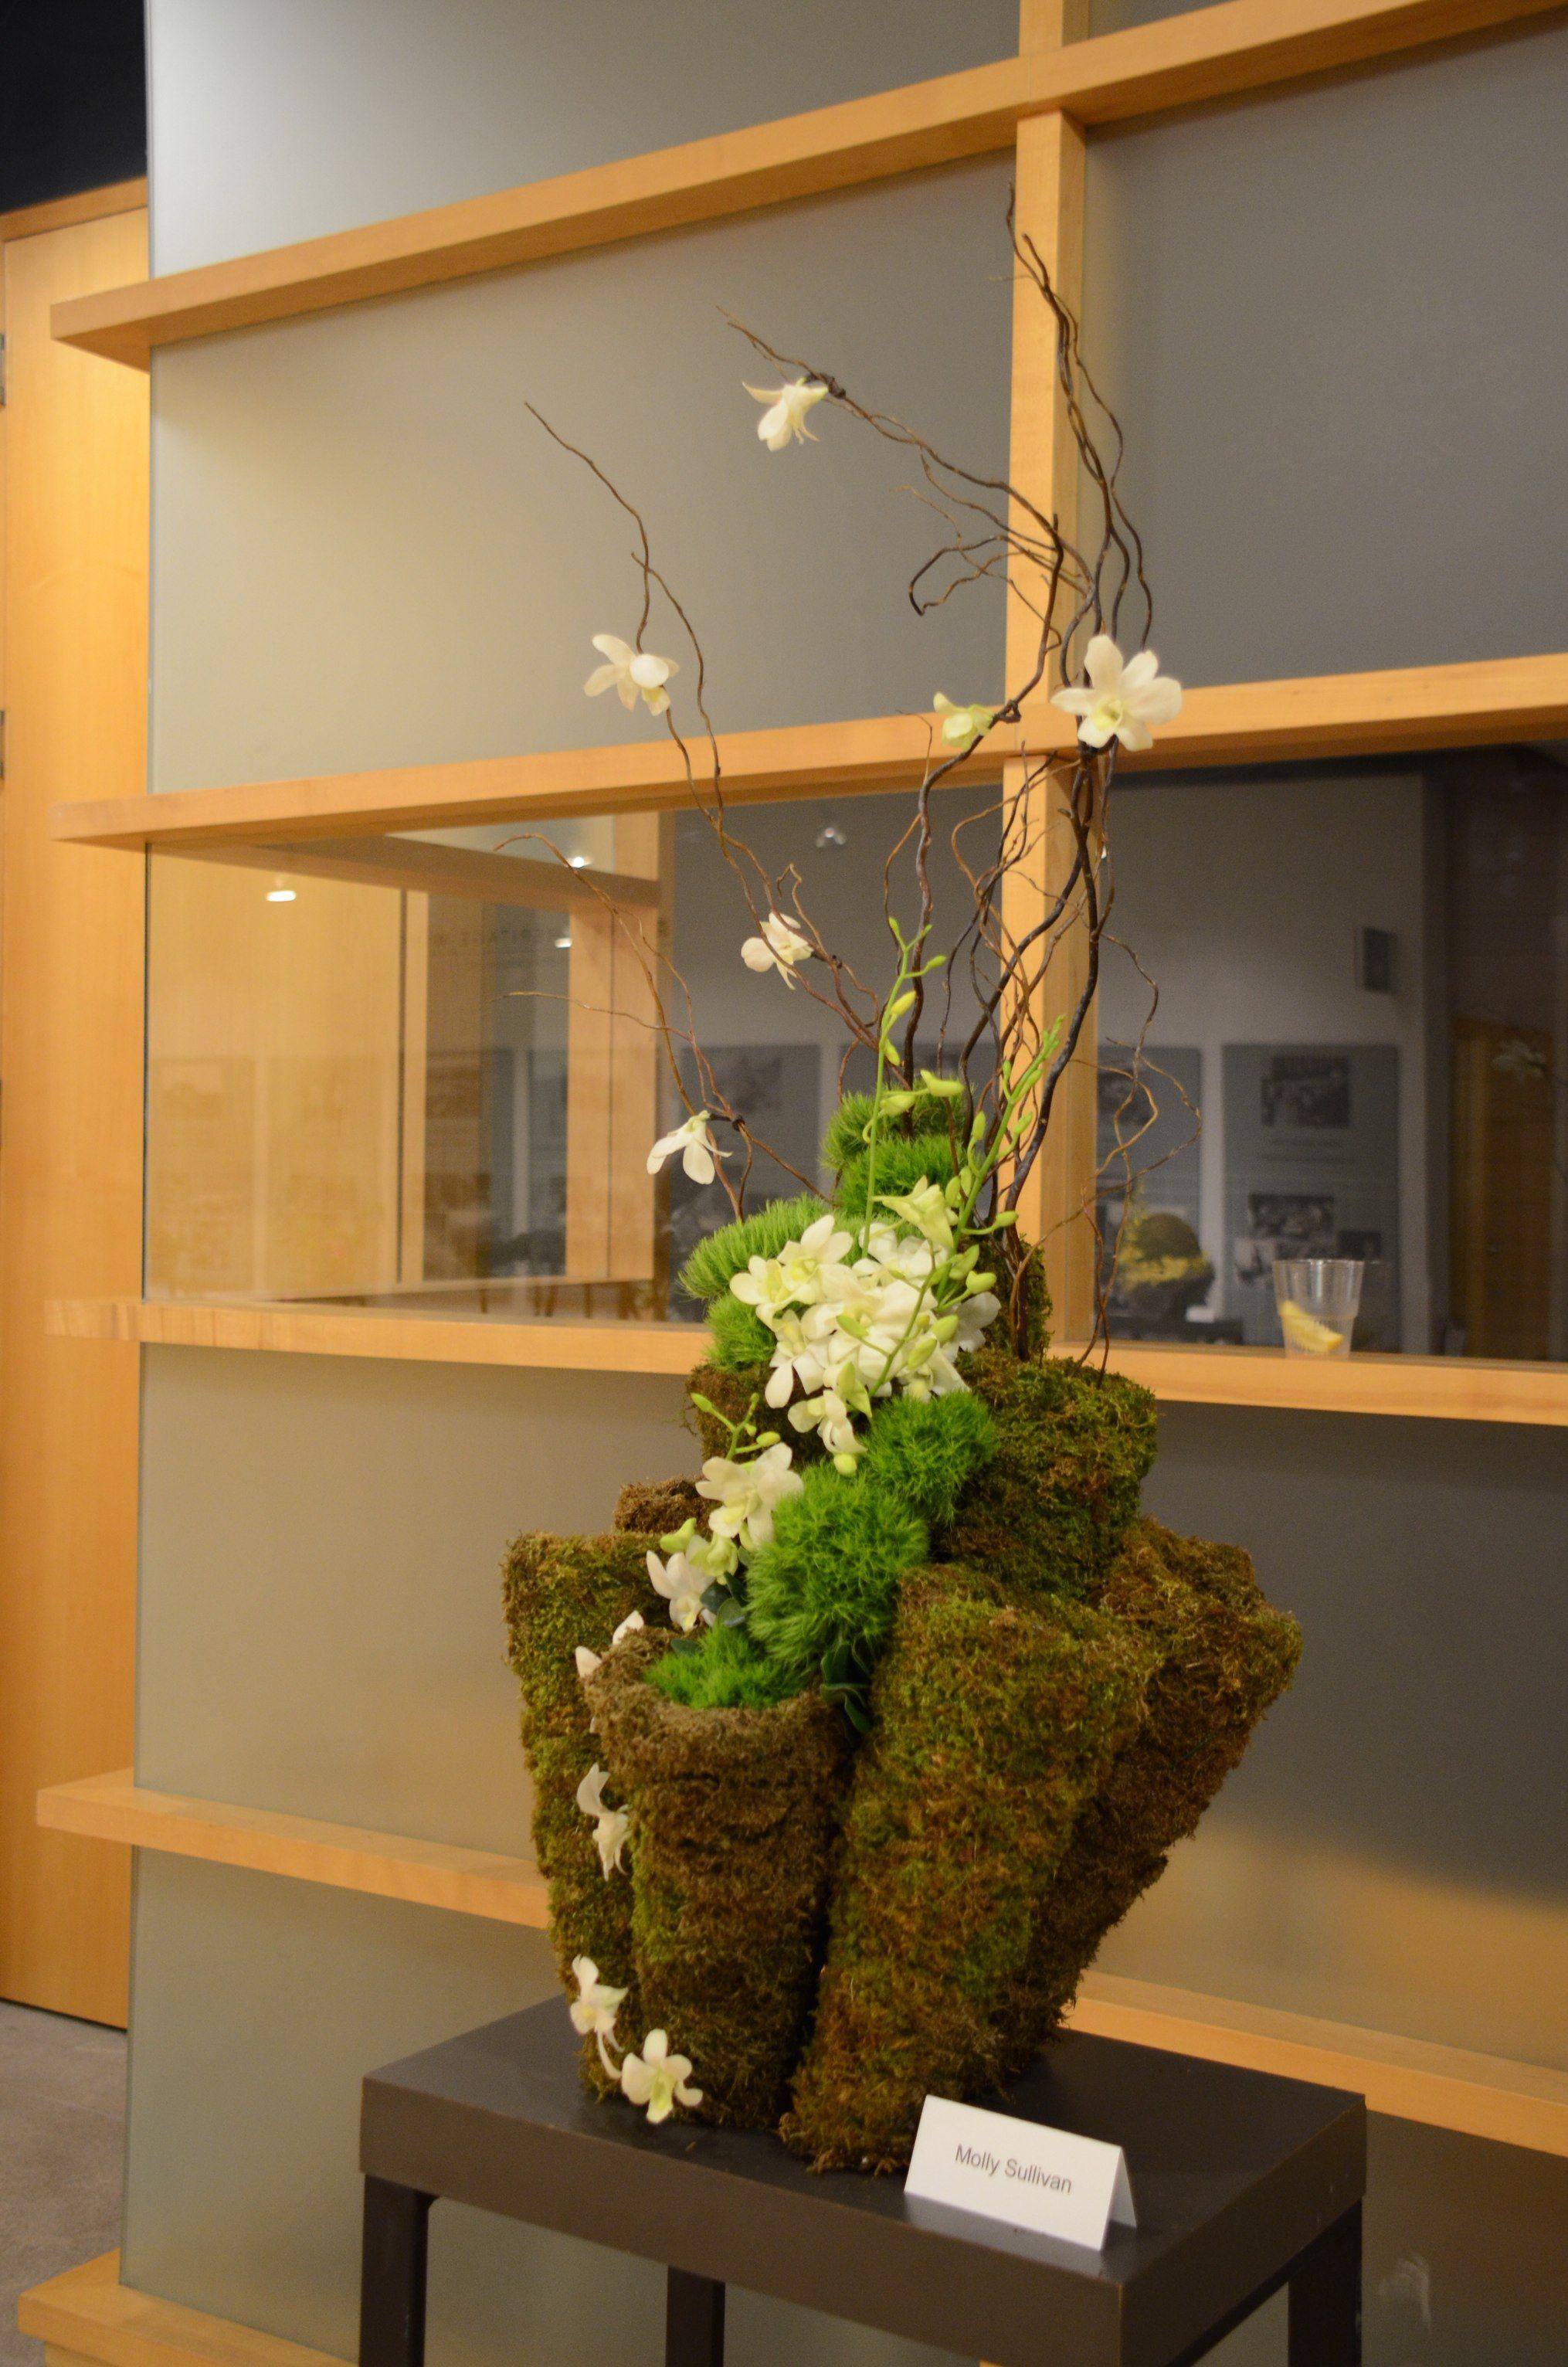 Floral arrangement Redefining Design 2013 Seneca College School of